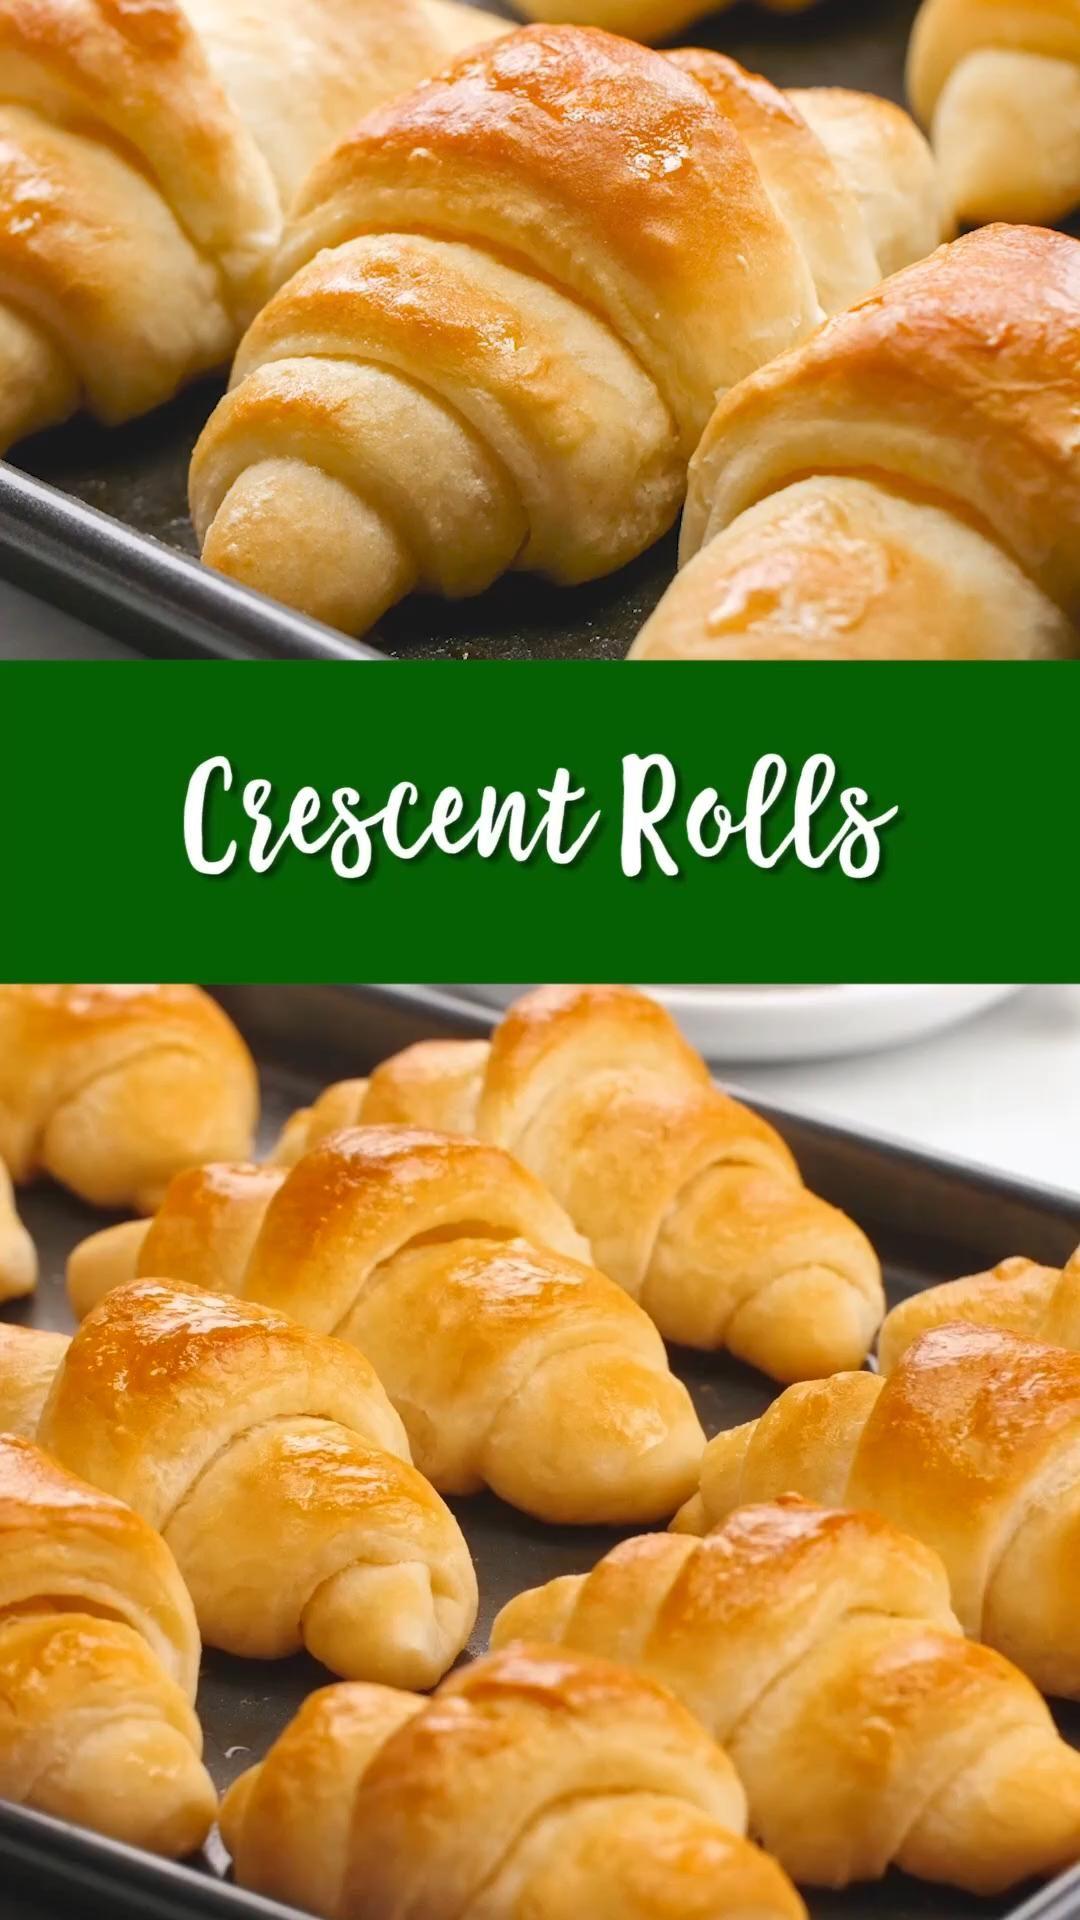 Photo of Cresent Rolls